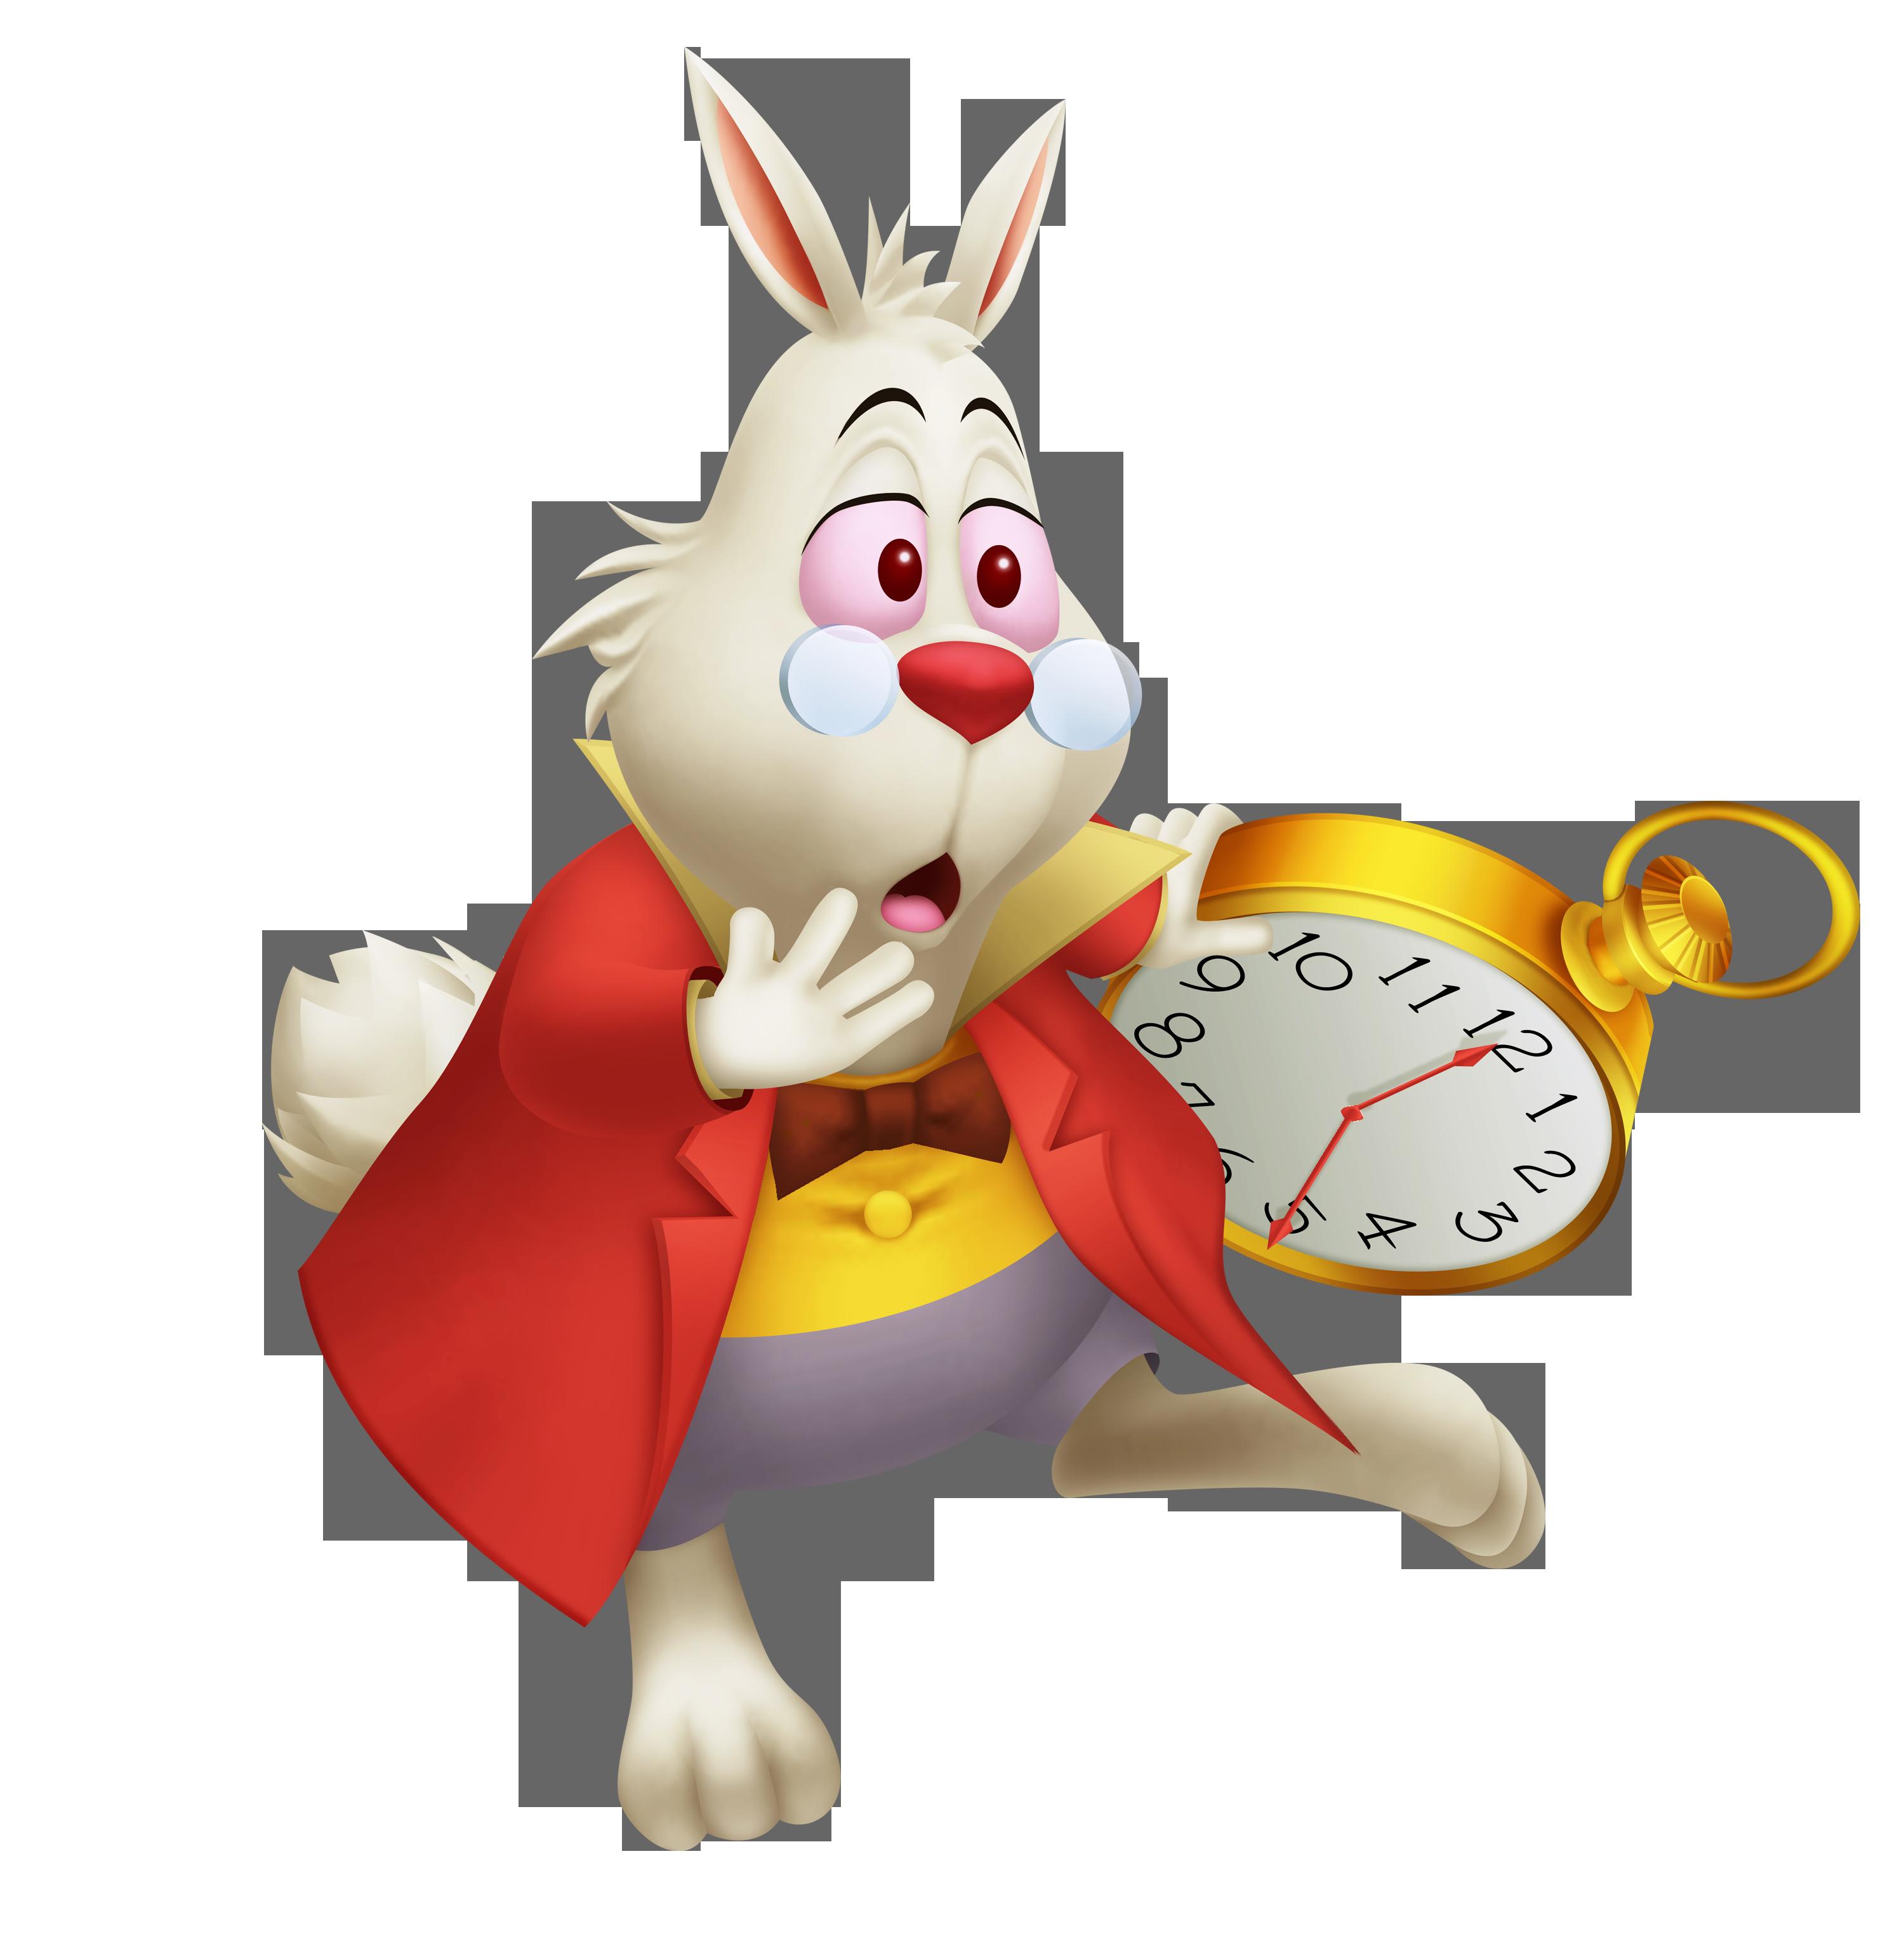 Mad clipart bunny. Image white rabbit khrec